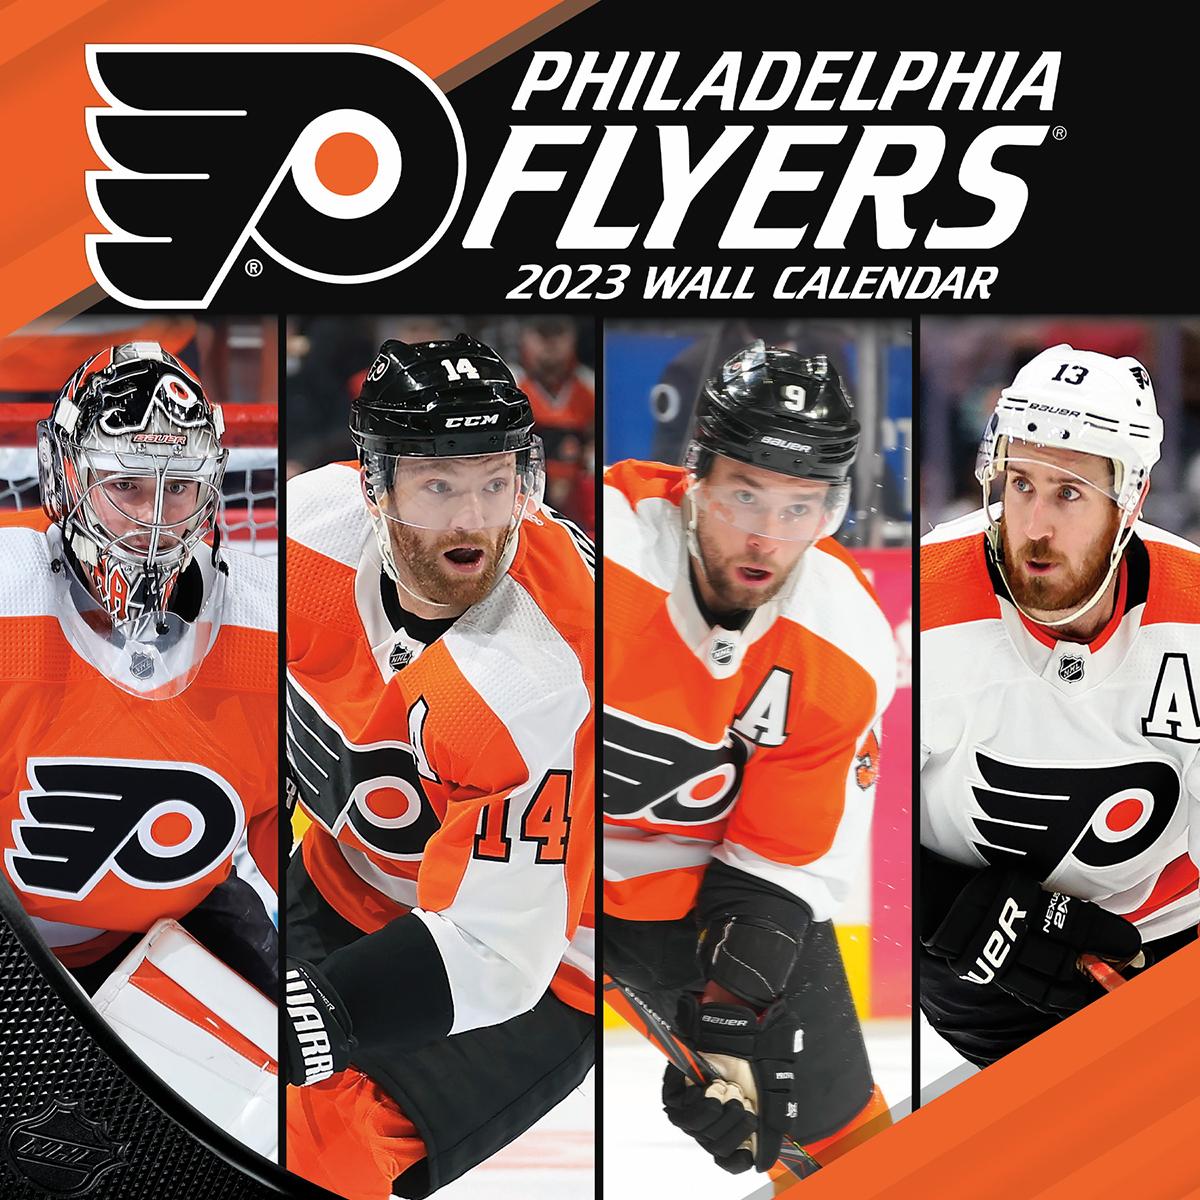 Philadelphia Flyers 2018 Nhl Wall Calendar Buy At Khc Sports